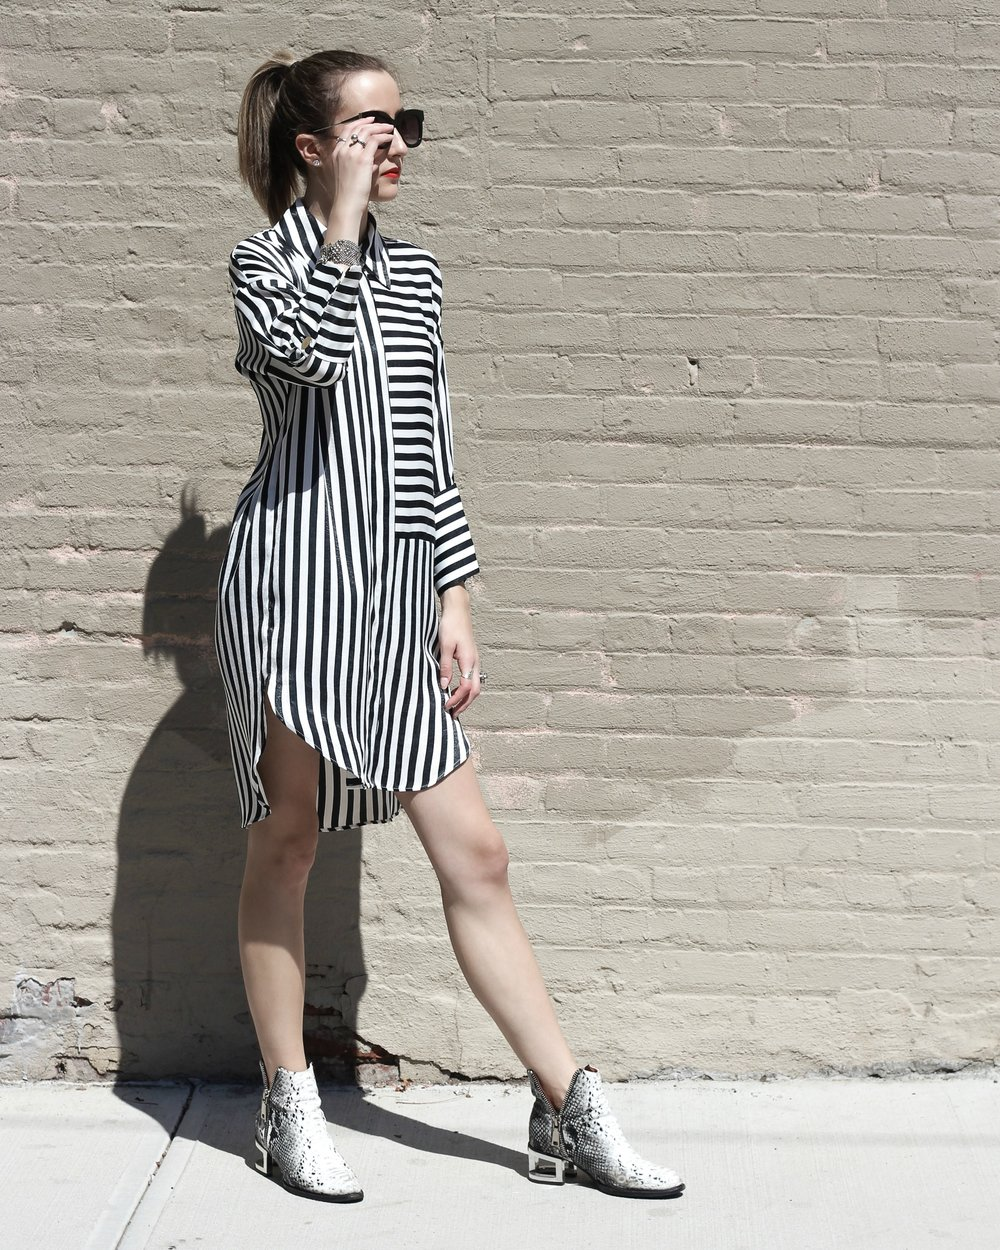 Directional Stripes-2.jpg